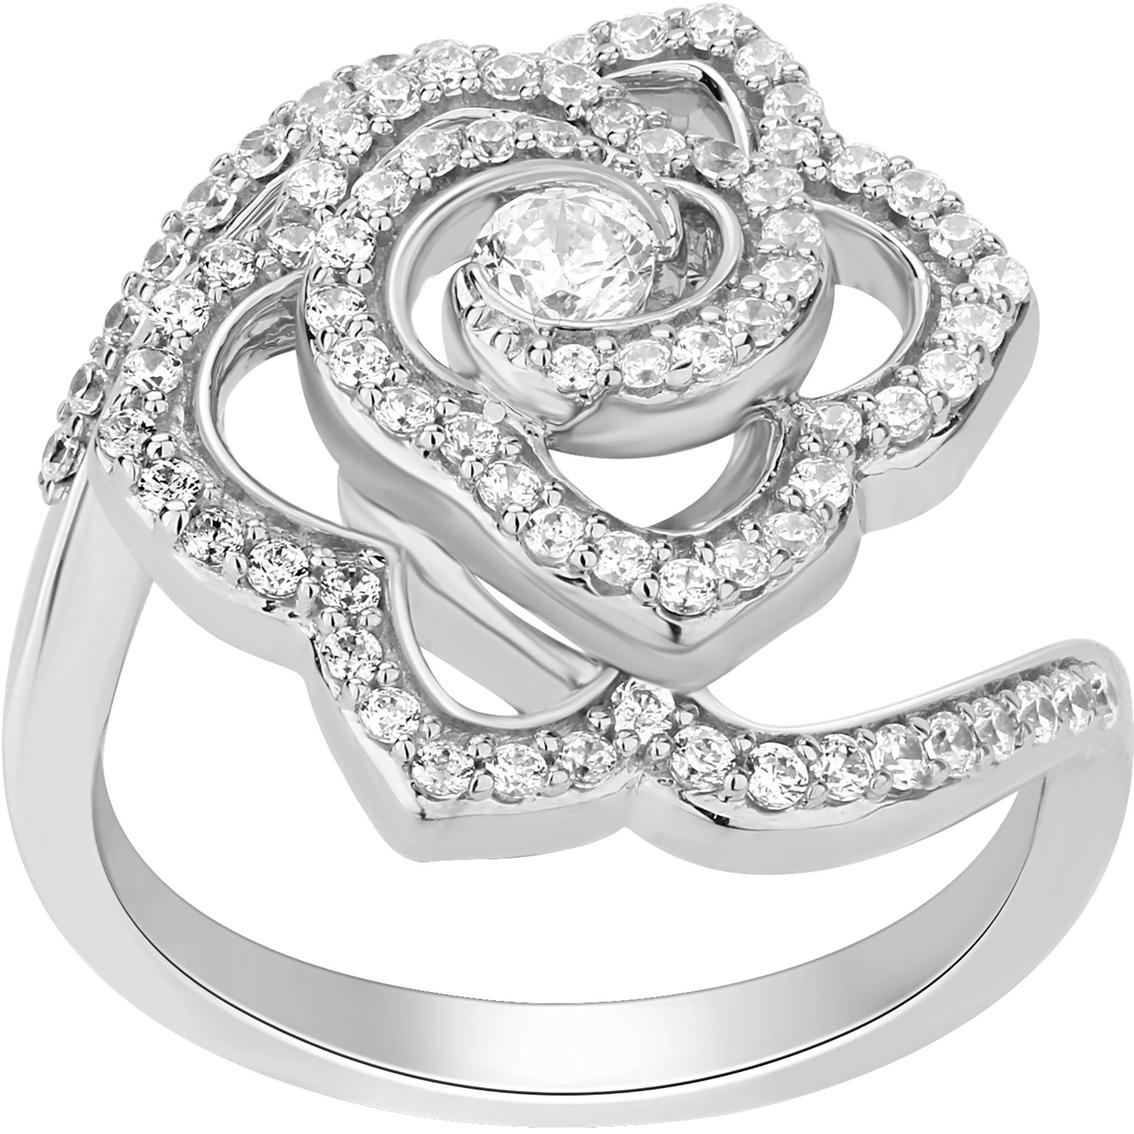 Enchanted Disney 14K White Gold 5 8 CTW Diamond Belle Rose Ring Size 7